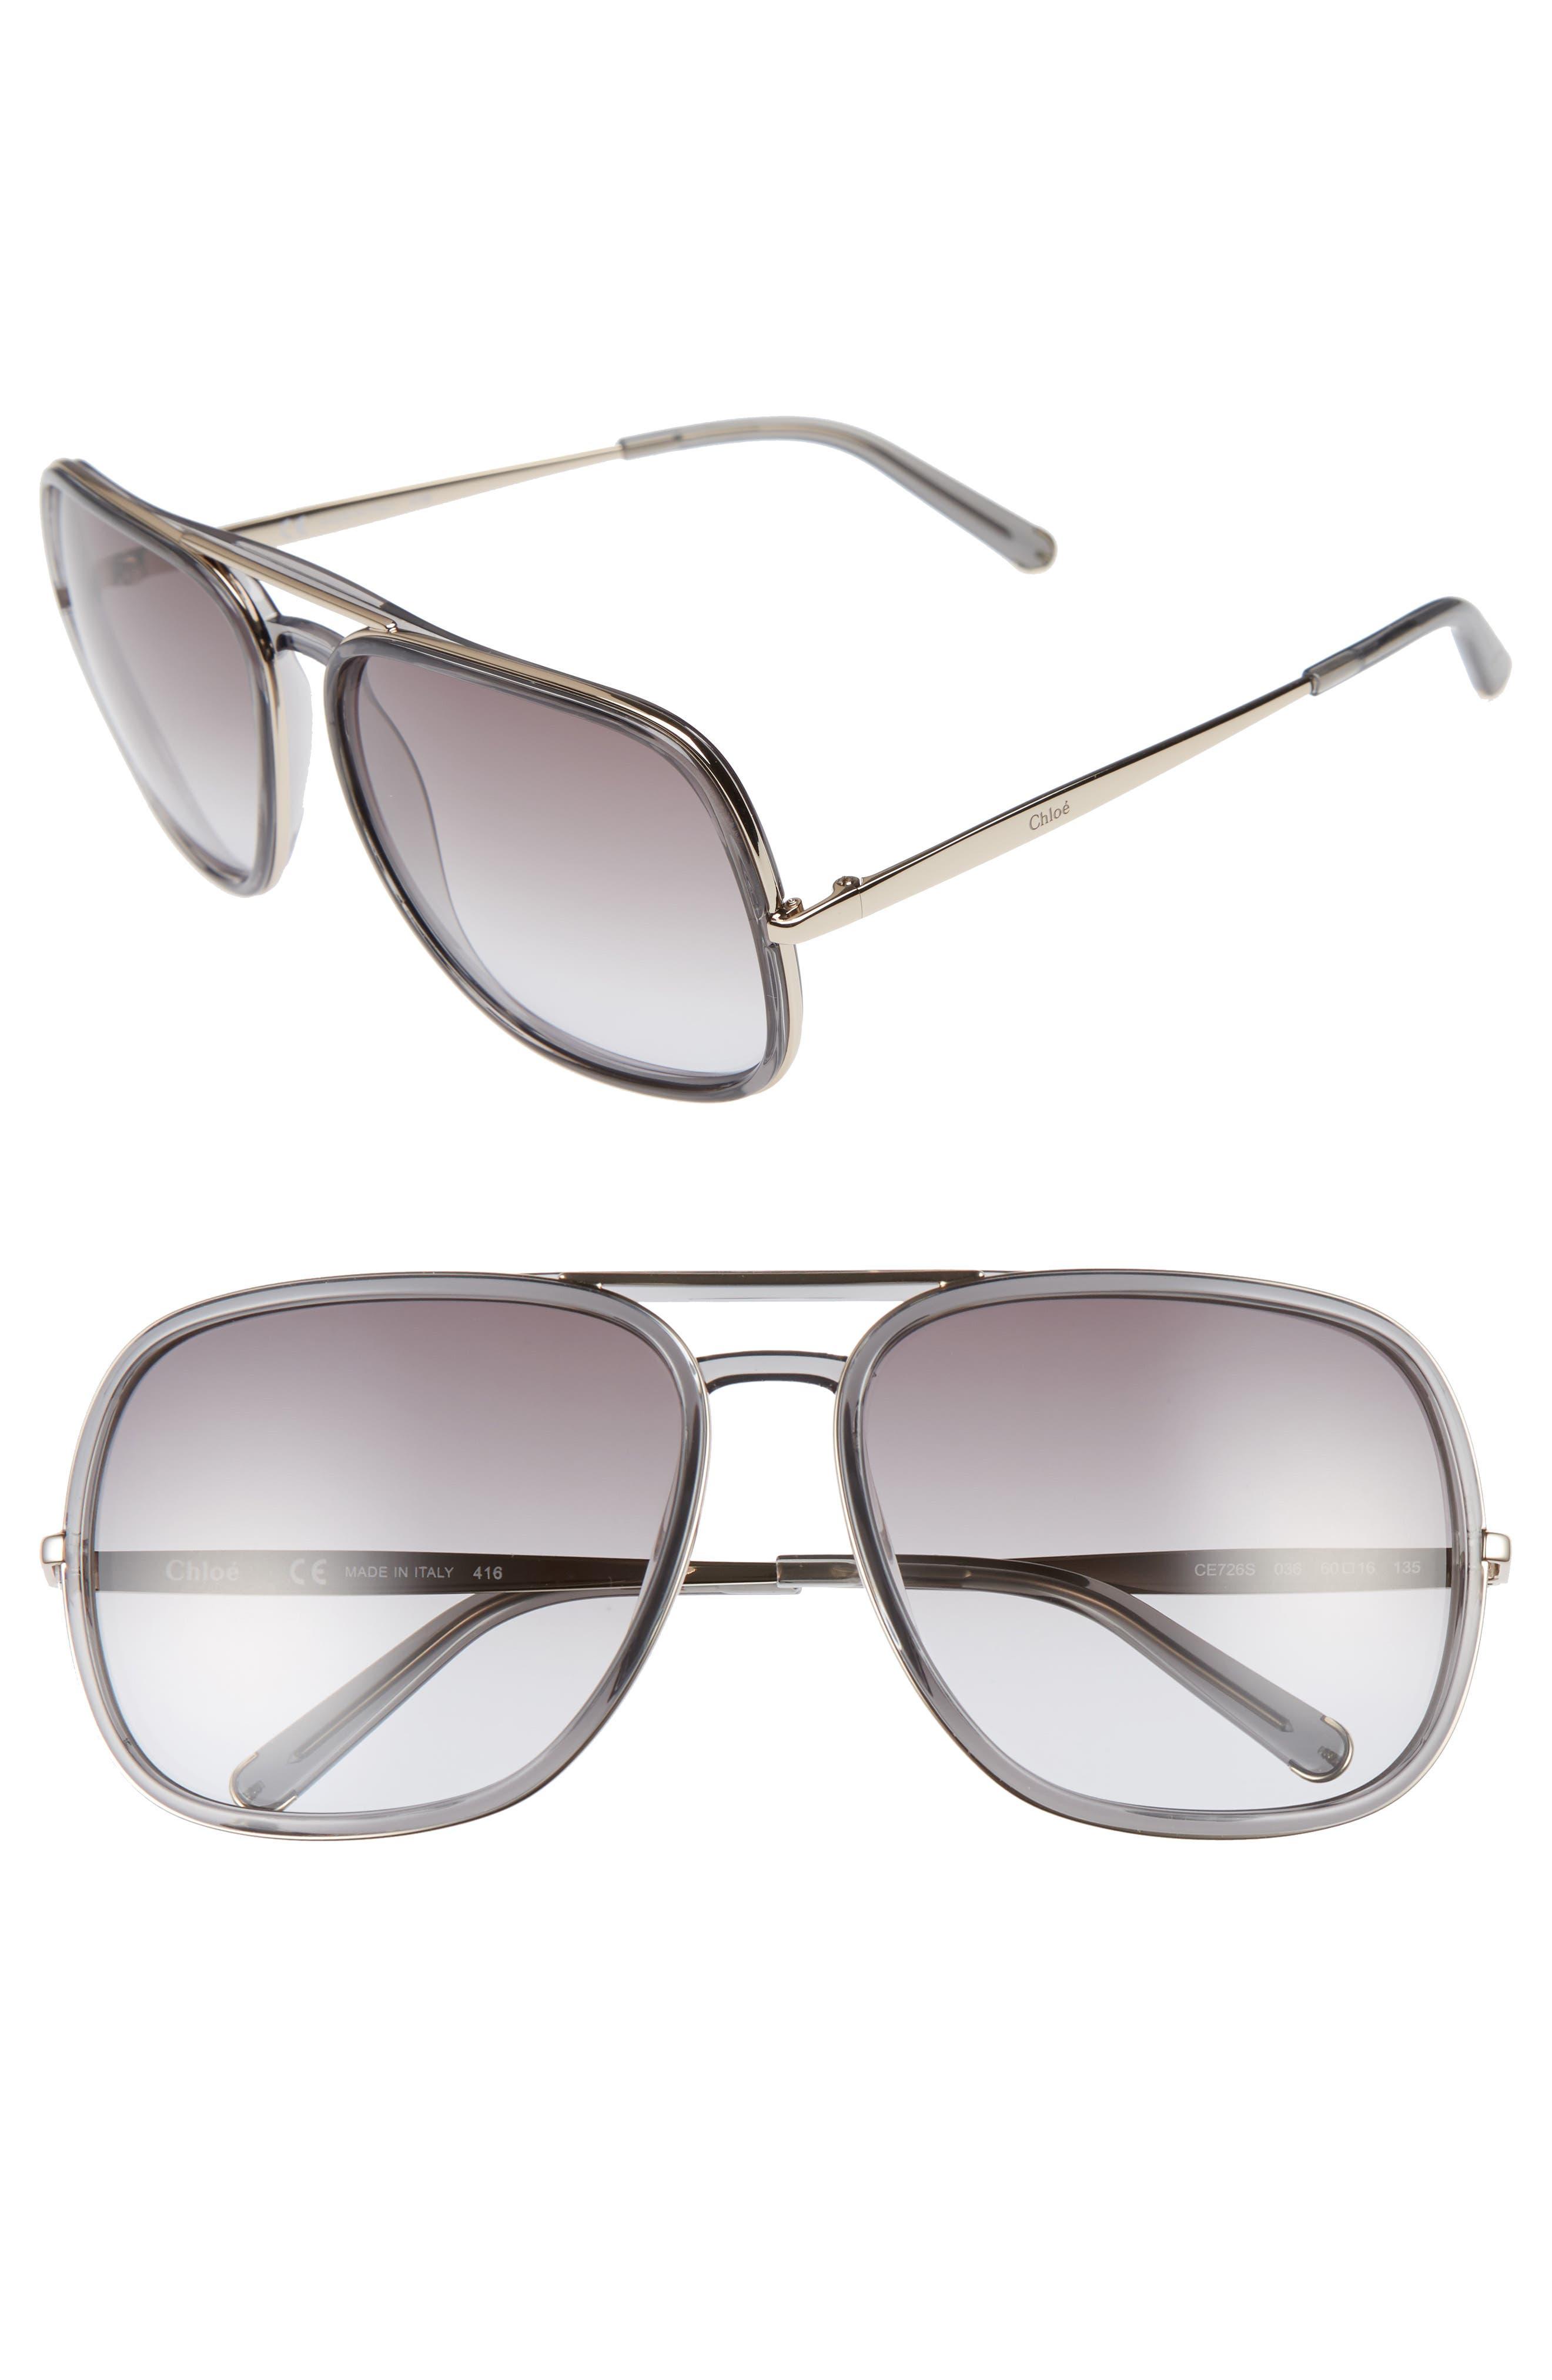 60mm Gradient Lens Navigator Sunglasses,                         Main,                         color, 020